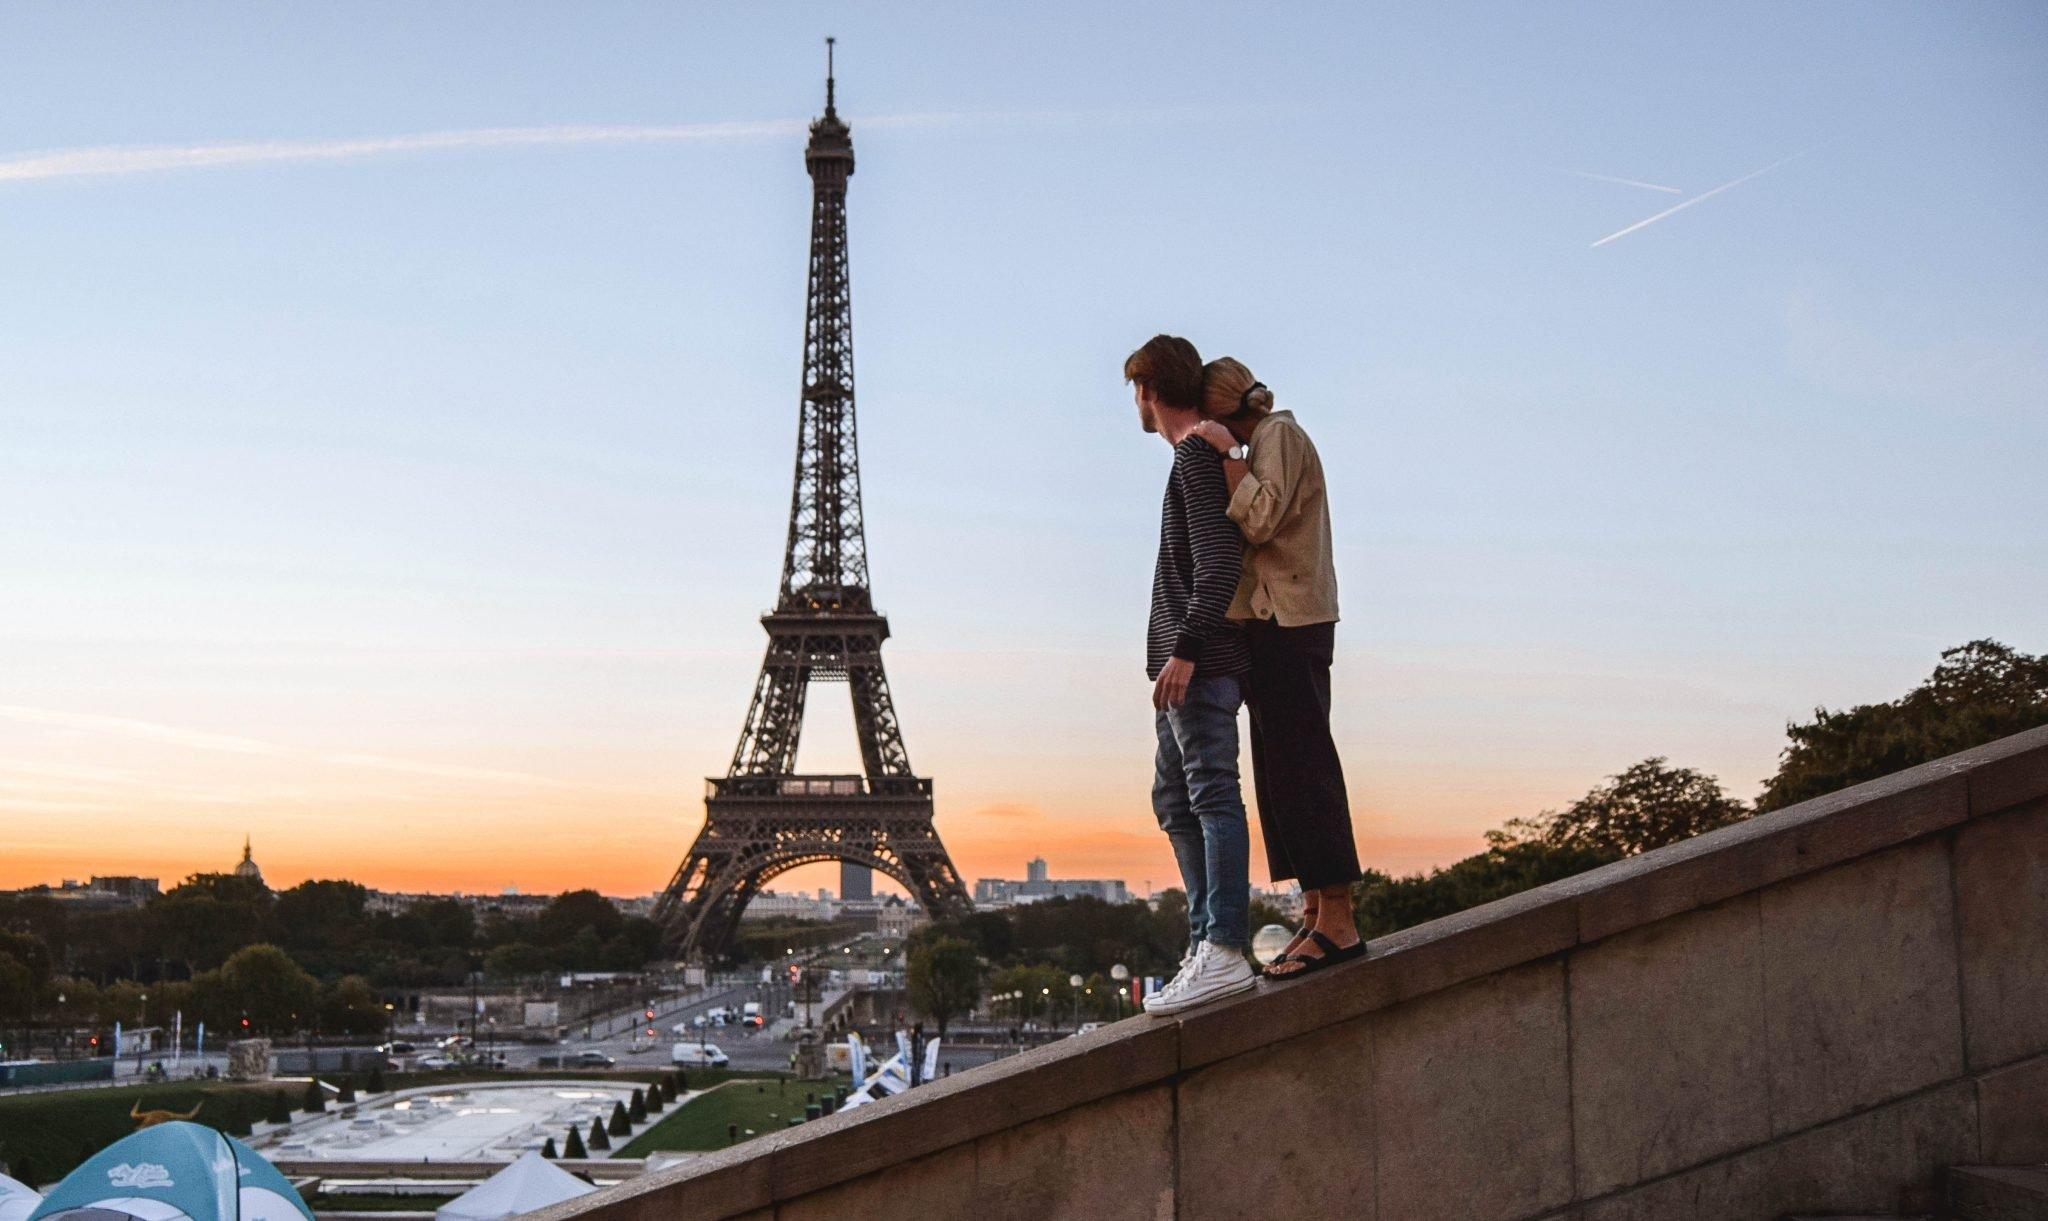 Wanderers & Warriors - Charlie & Lauren UK Travel Couple - Two Days In Paris Itinerary - Trocadero Steps Eiffel Tower Paris